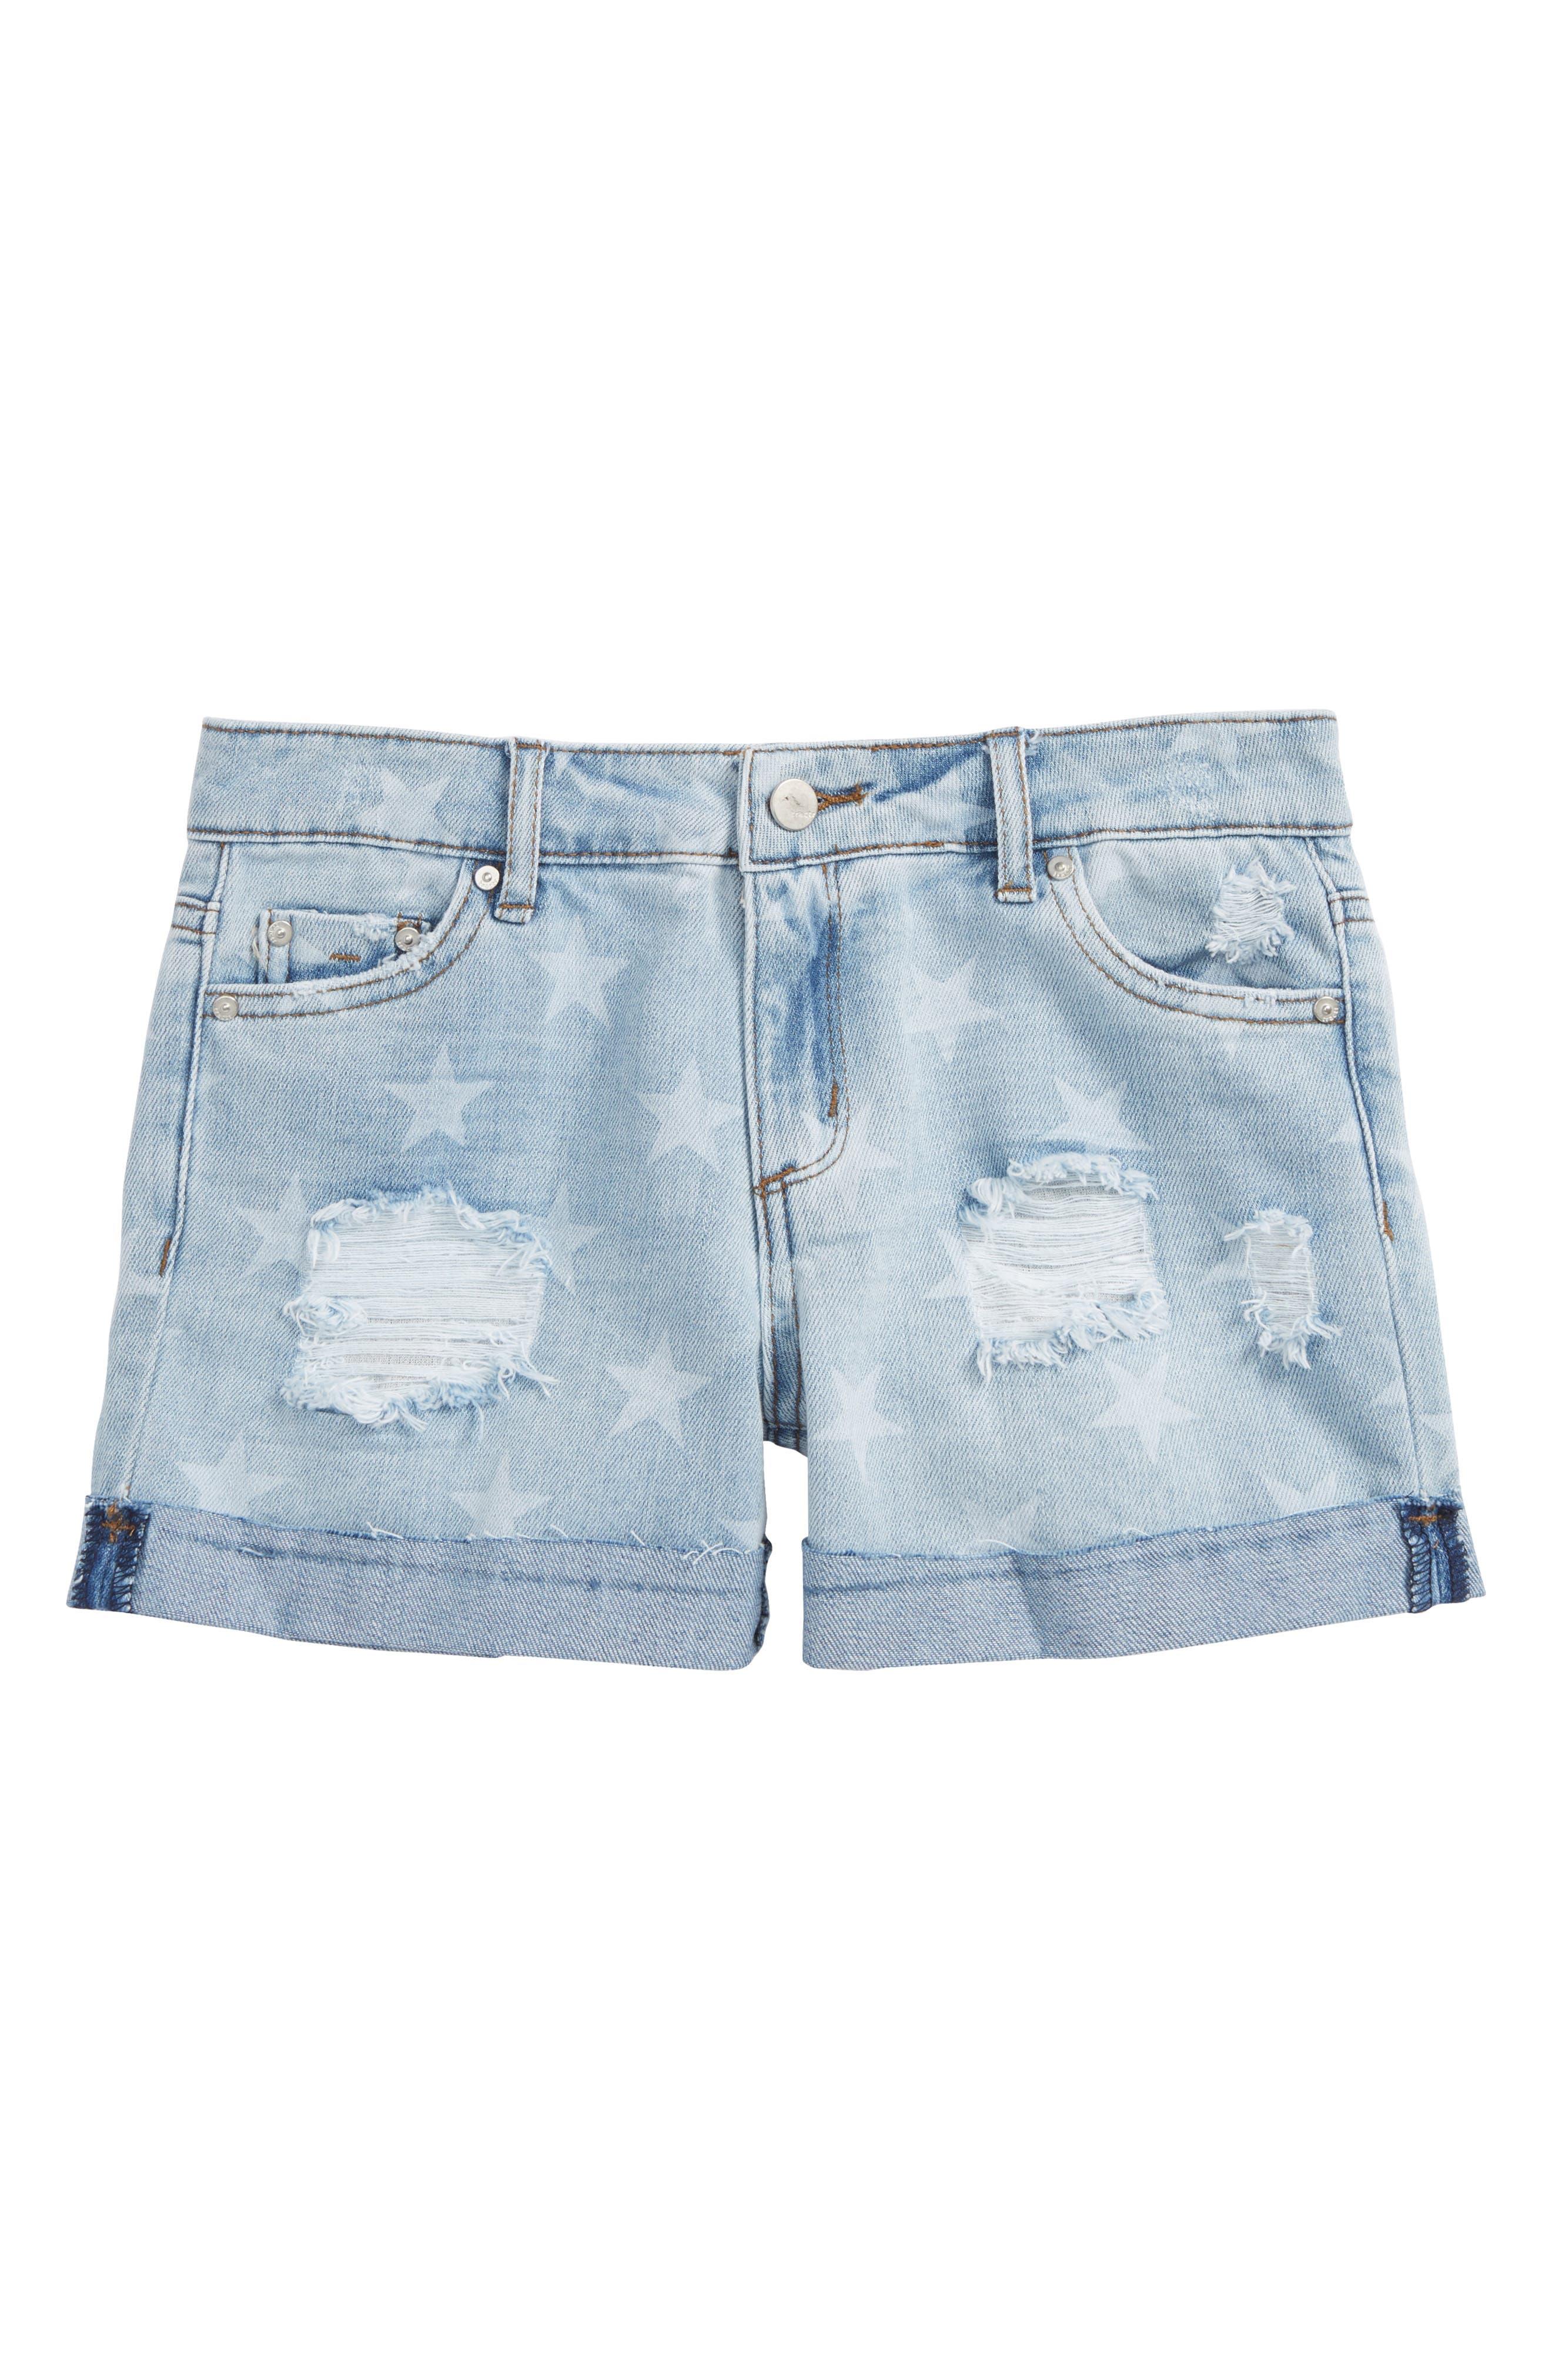 Tractr Star Roll Distressed Denim Shorts (Big Girls)